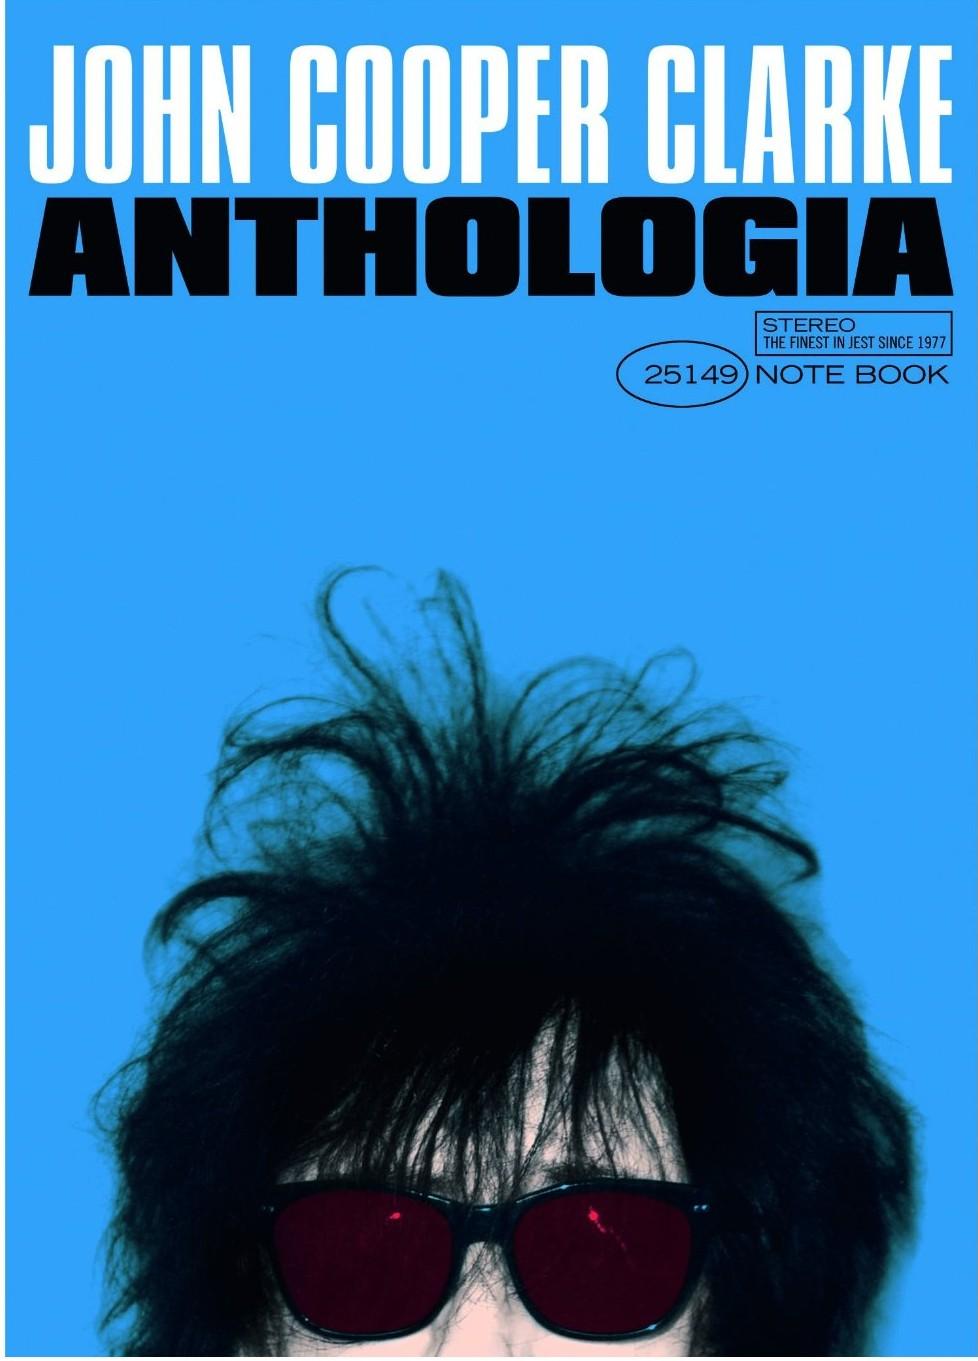 John Cooper Clarke / Anthologia 4-disc box